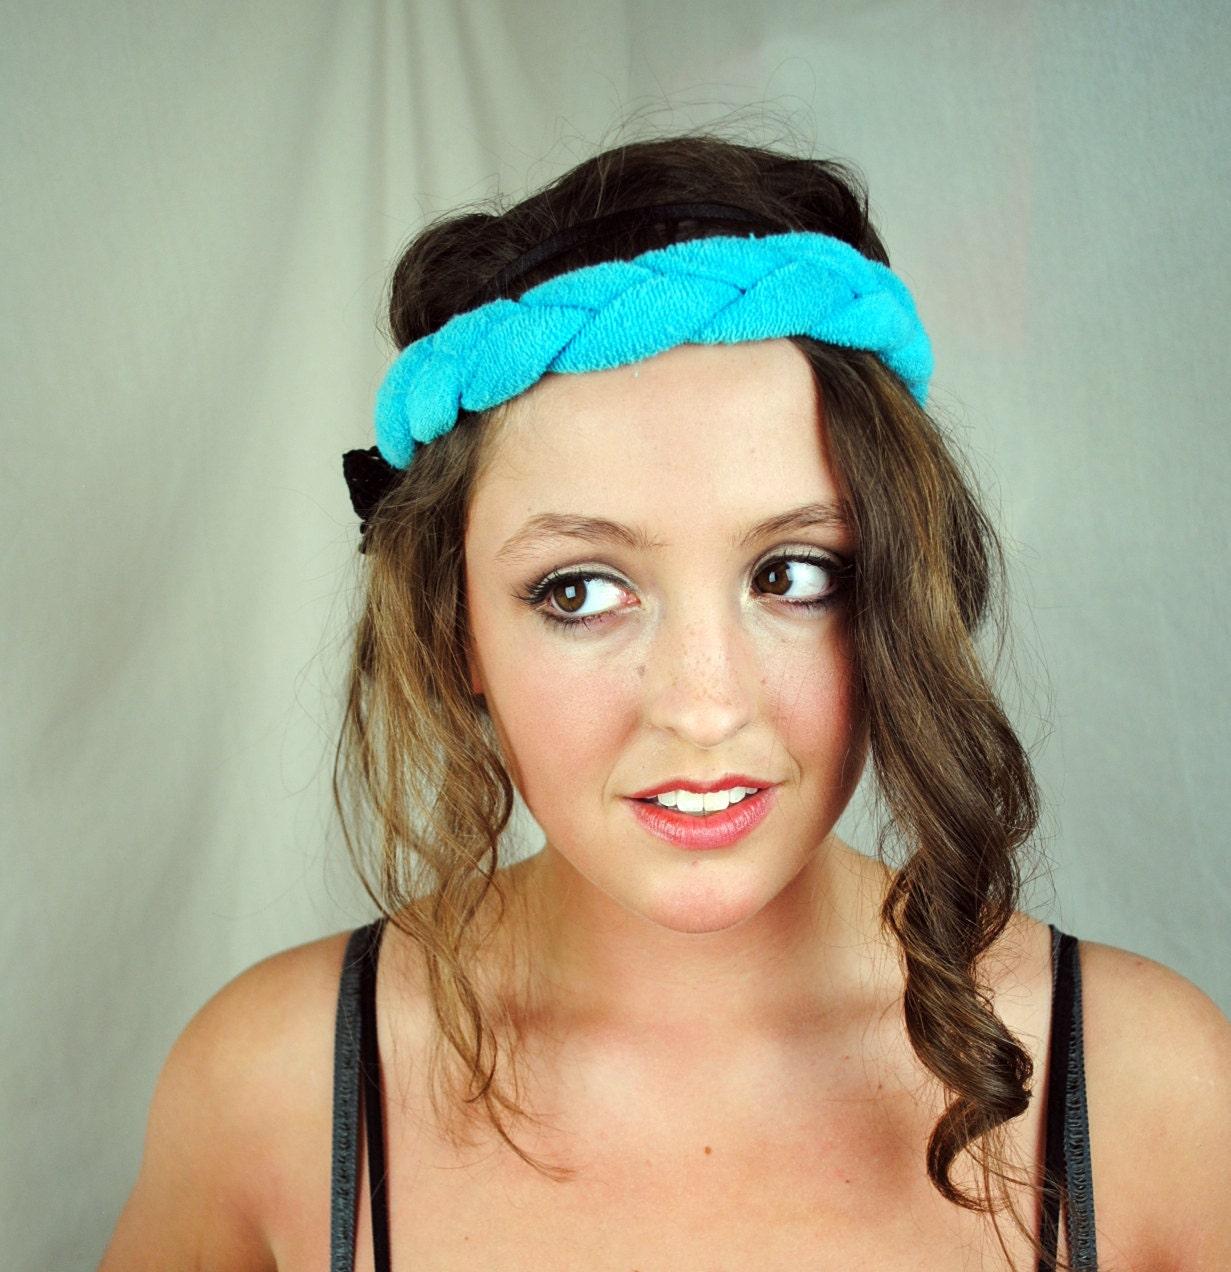 Astounding Vintage Teal Braided 80S Headband Hairstyle Inspiration Daily Dogsangcom